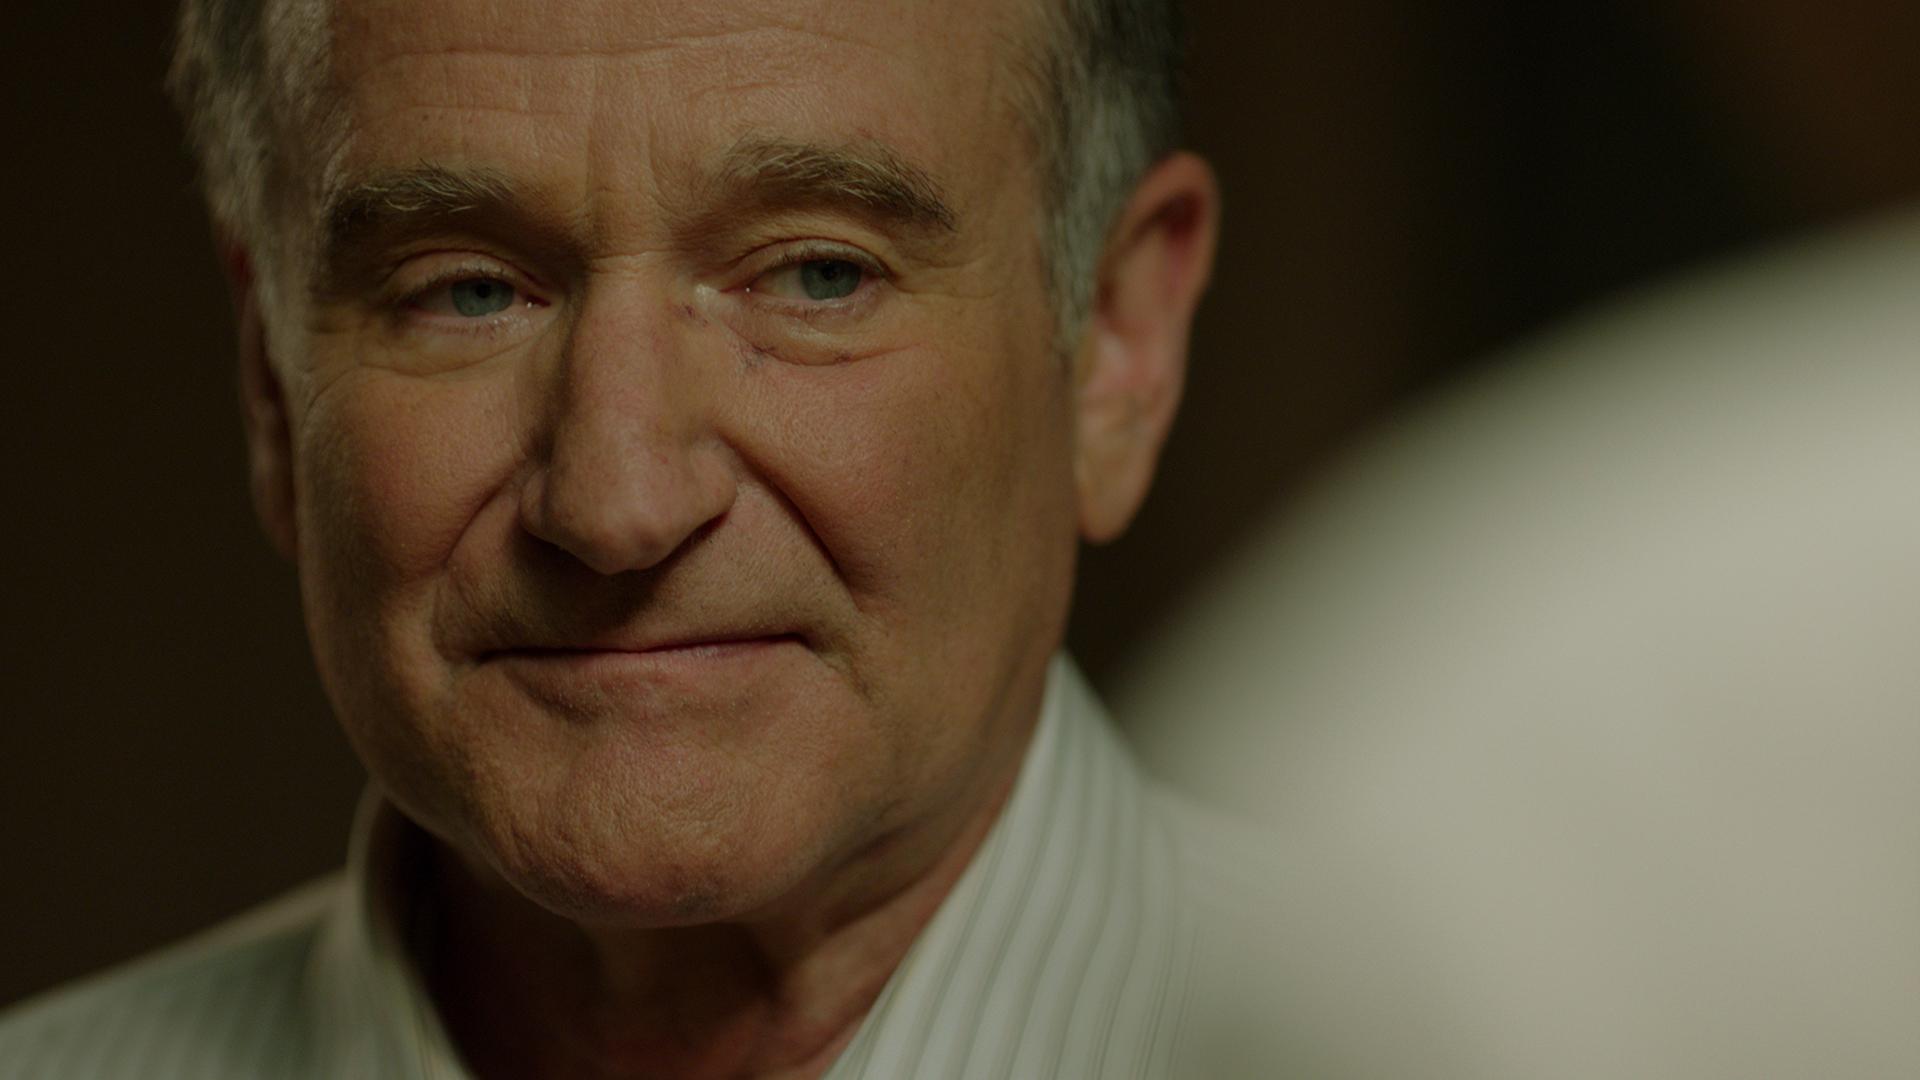 Robin Williams in 'Boulevard' (Photo: Starz Digital)